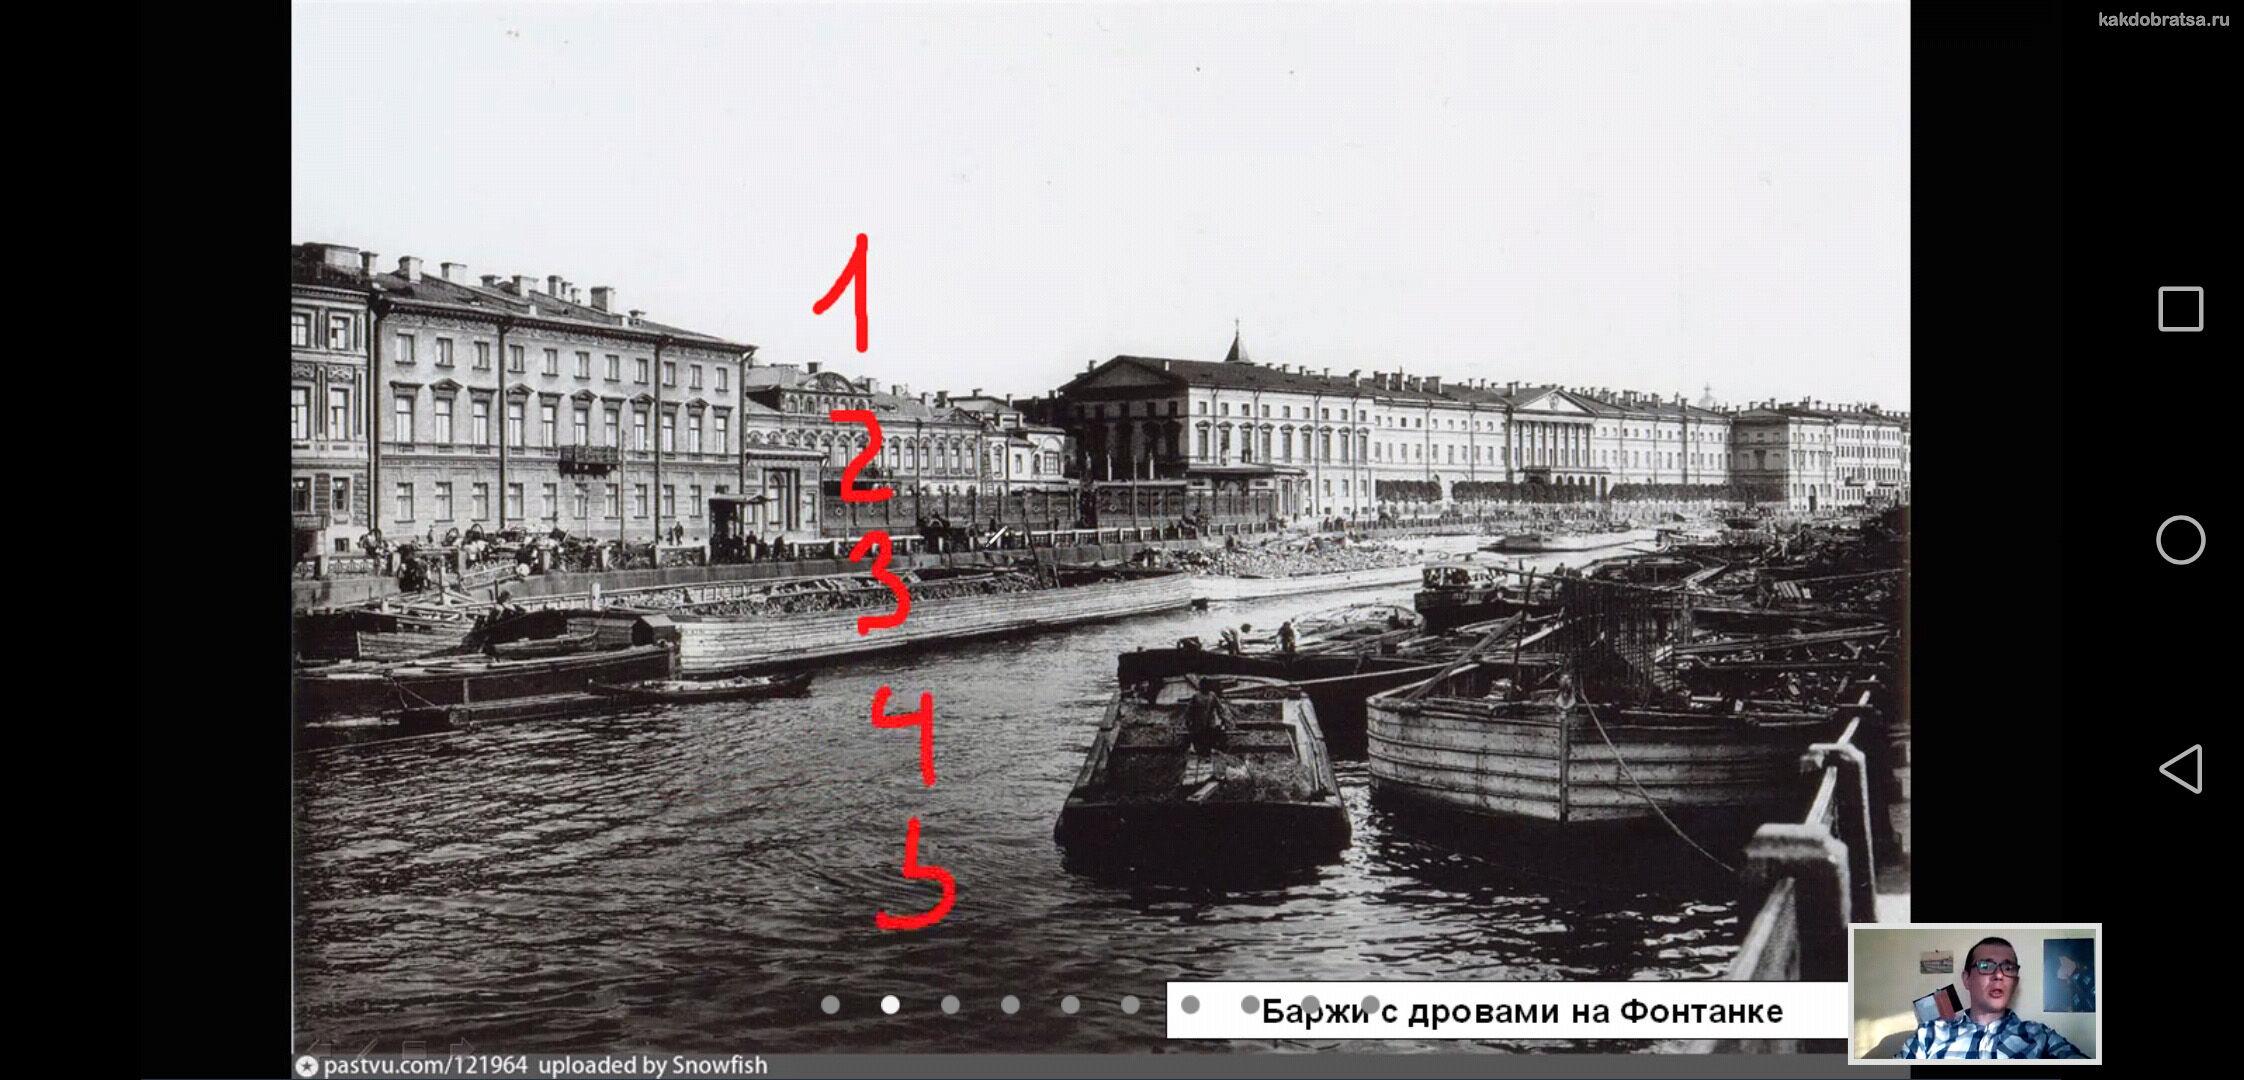 Экскурсия онлайн по Санкт-Петербургу